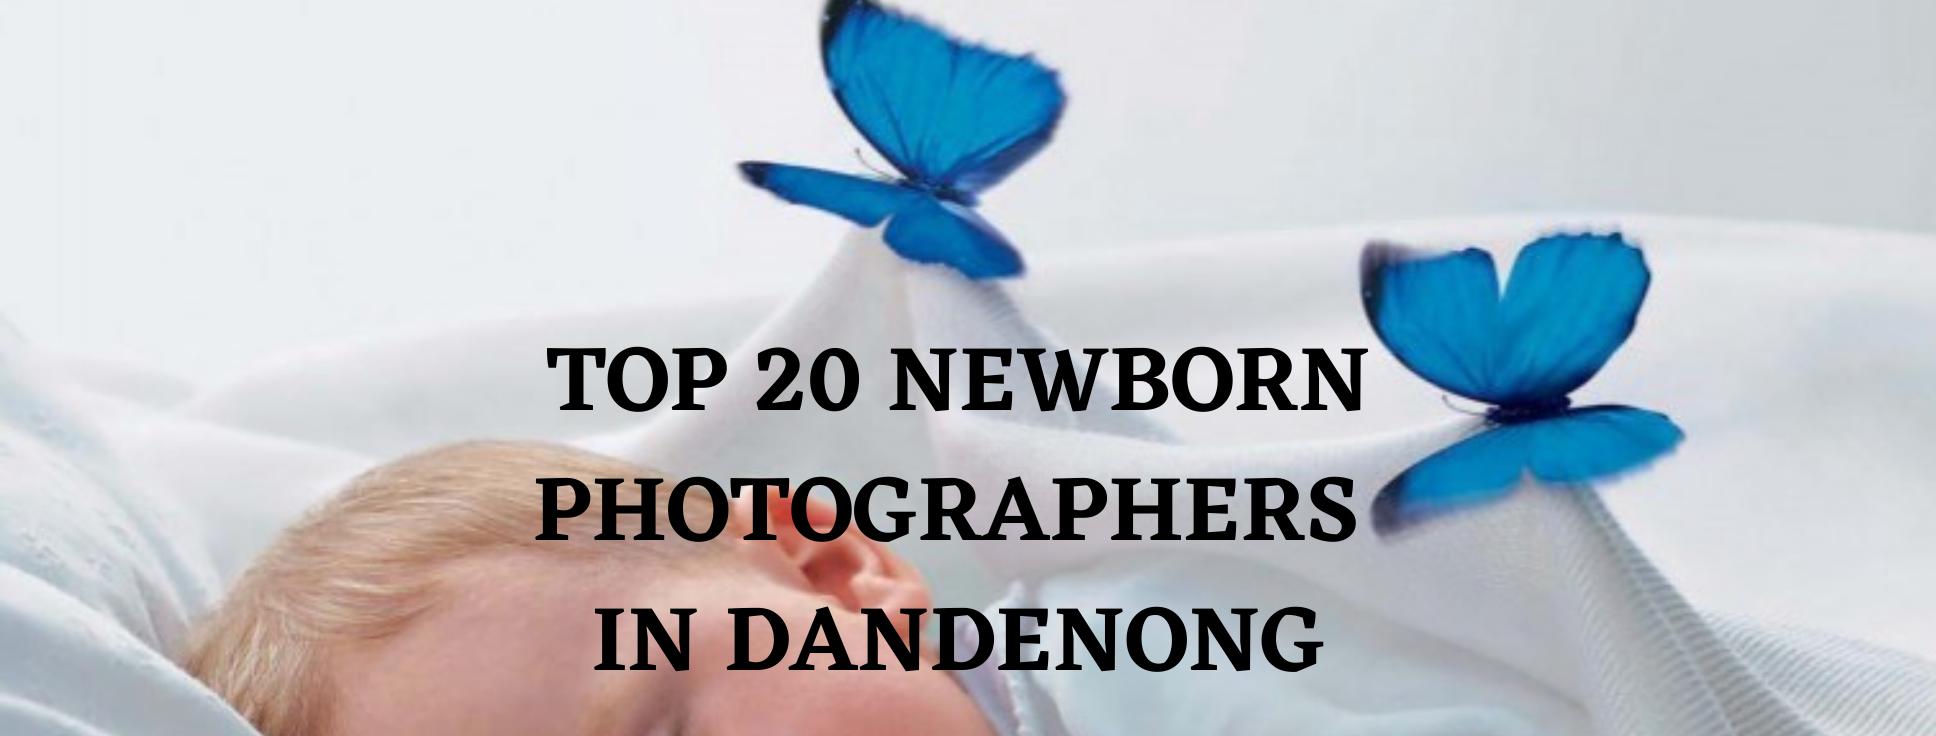 TOP 20 NEWBORN PHOTOGRAPHERS IN DANDENONG